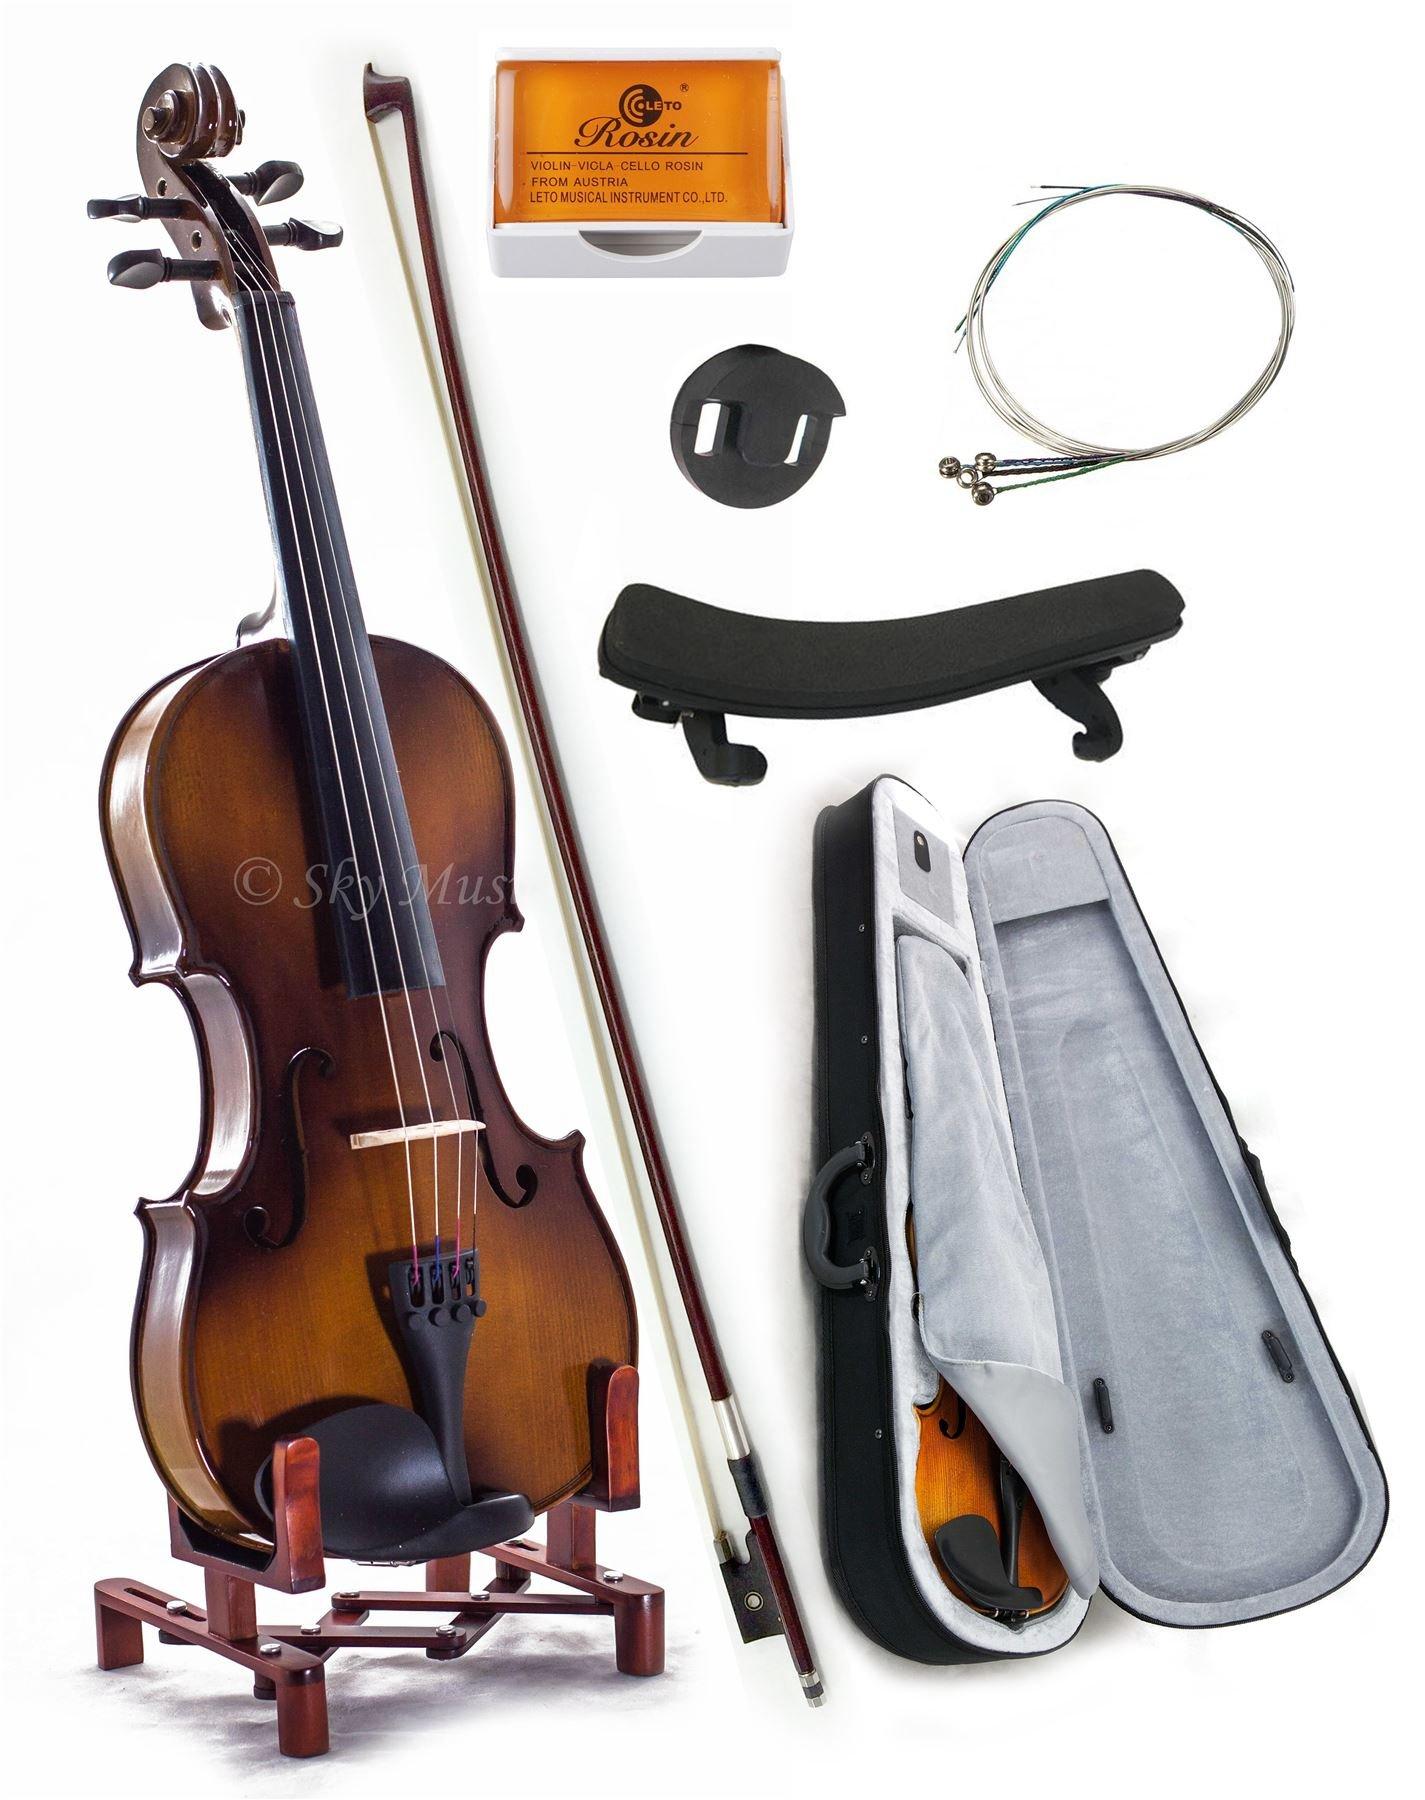 SKY 4/4 Full Size SKYVN201 Solid Maple Wood Violin